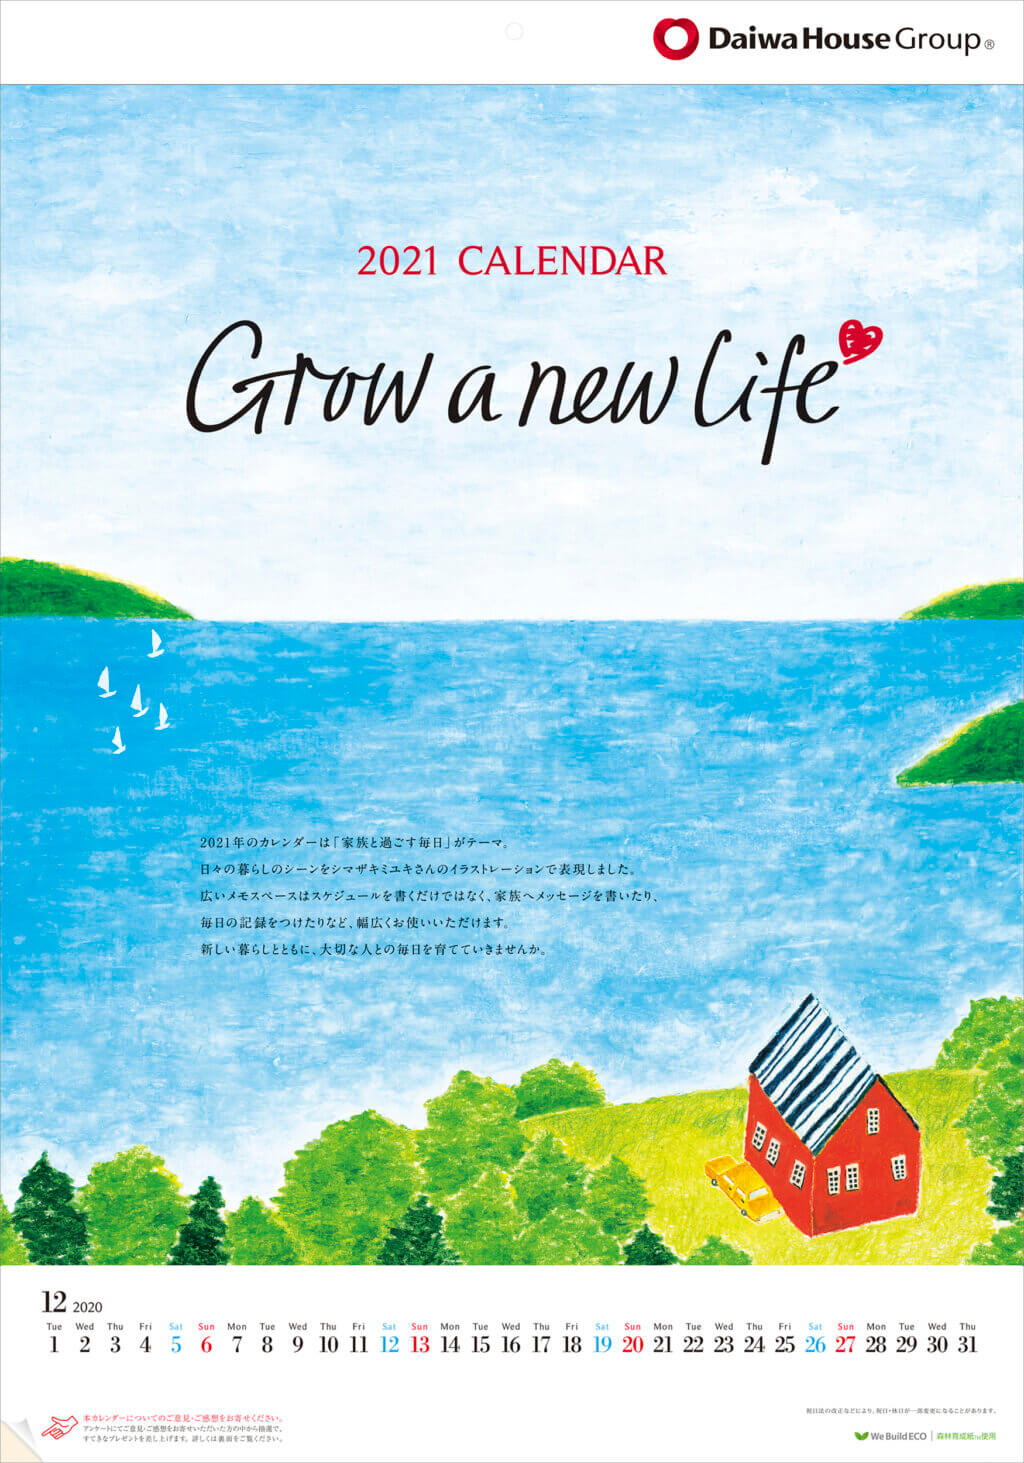 「Grow a new life」大和ハウス工業2021年カレンダー 表紙「海が見える家」